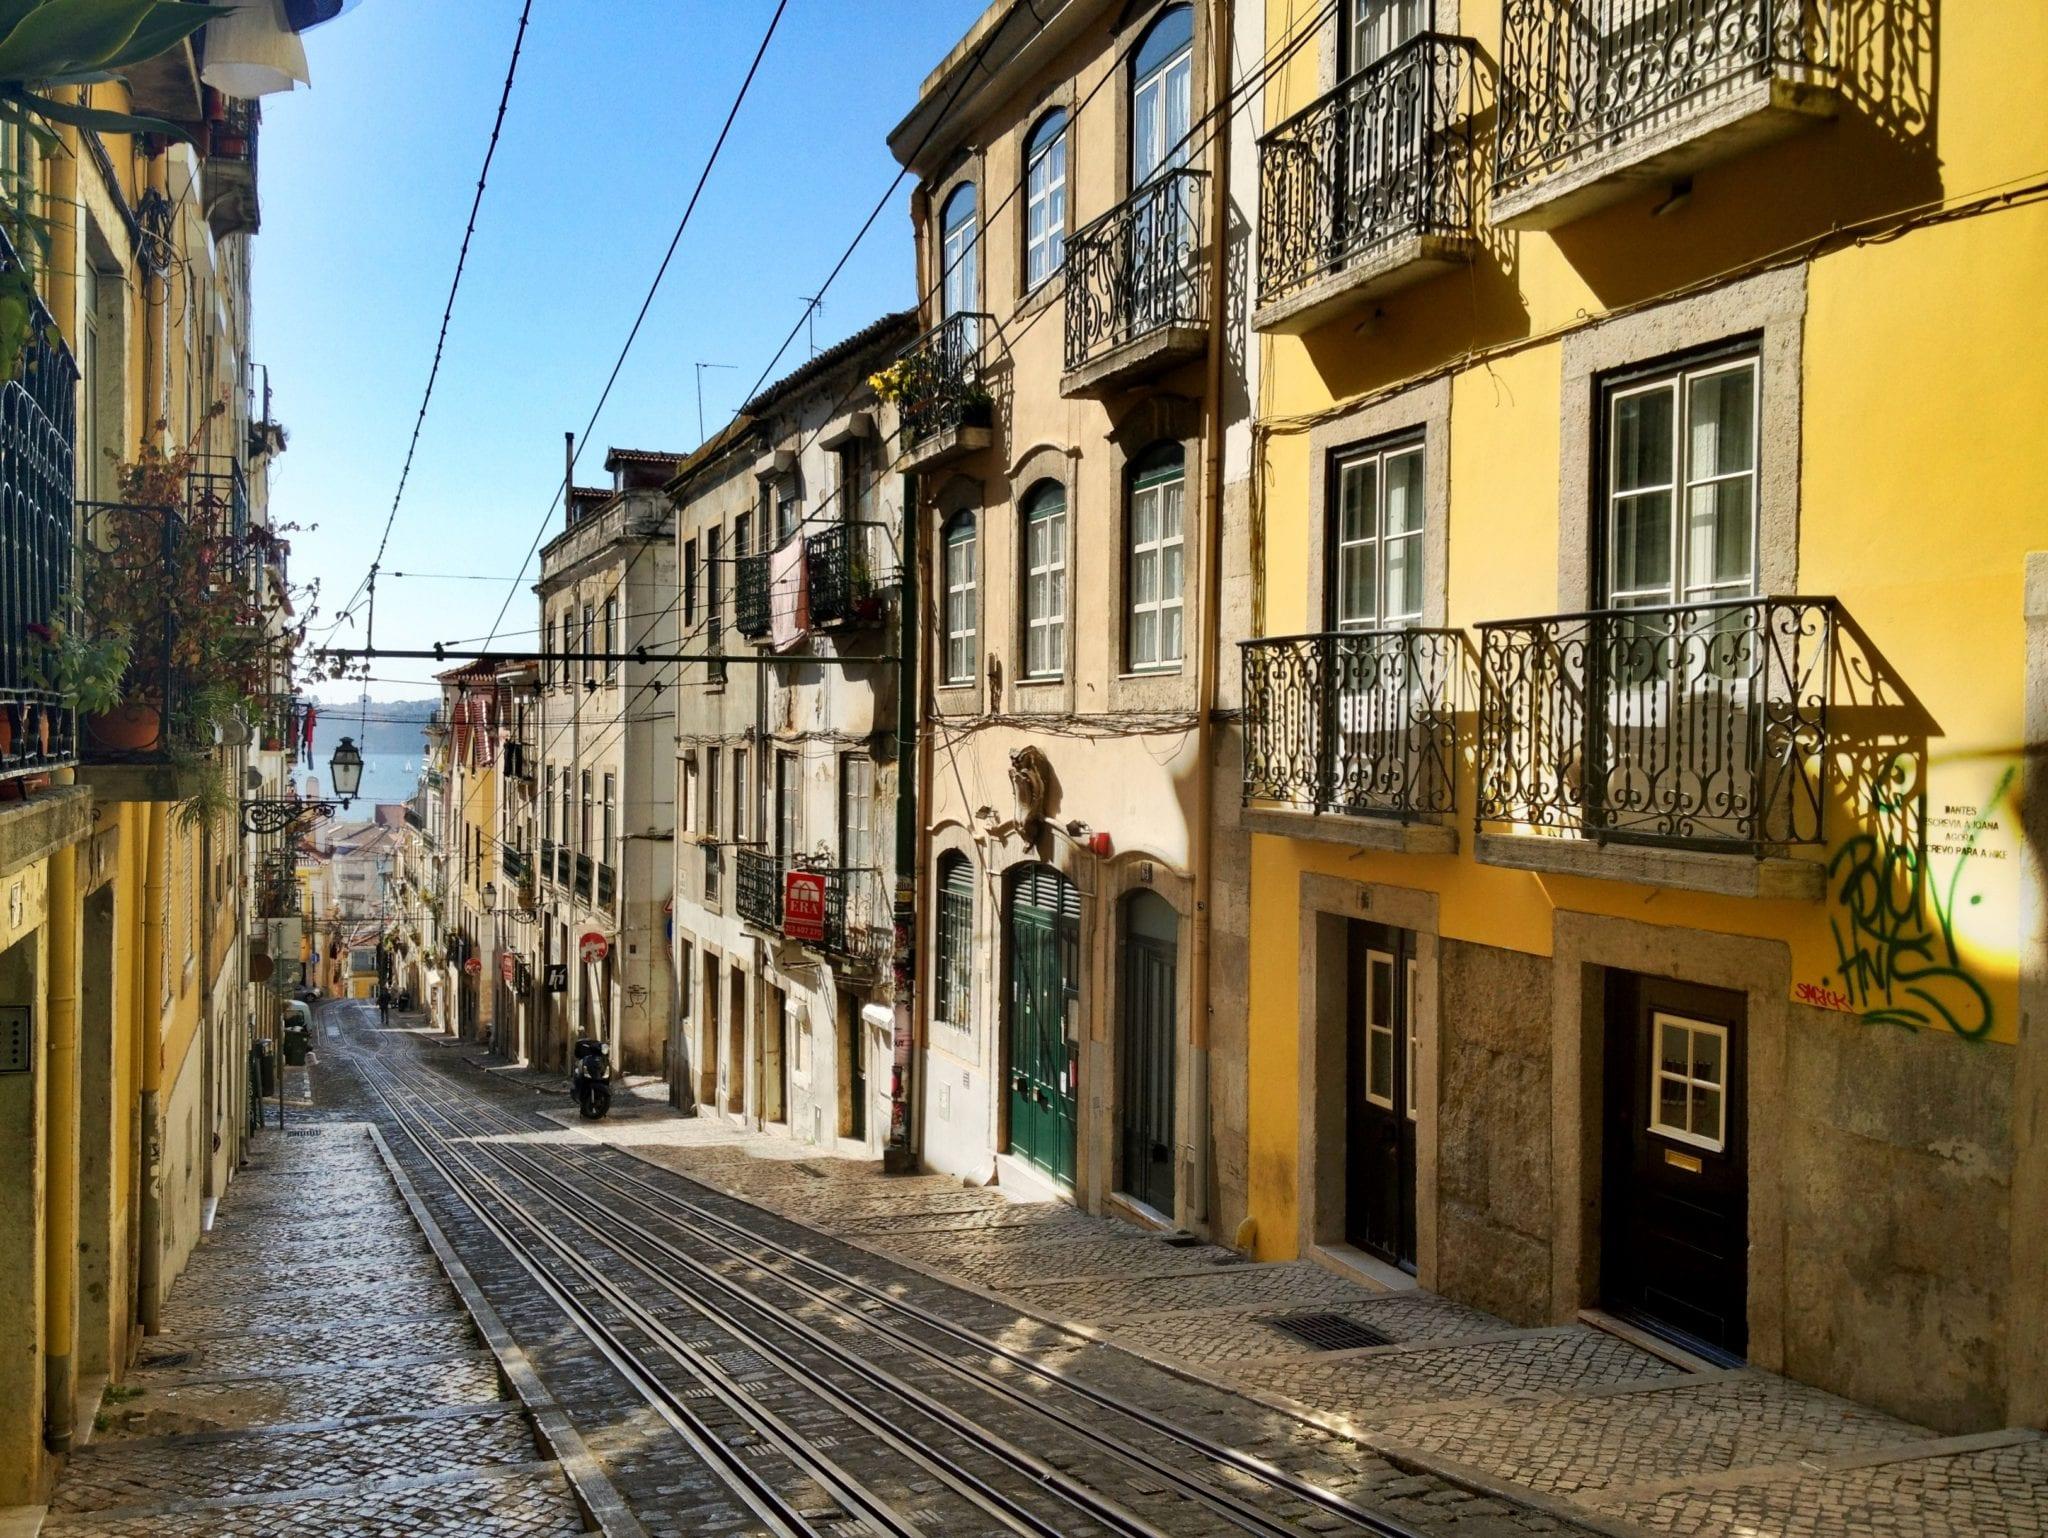 Lisbon is BEAUTIFUL